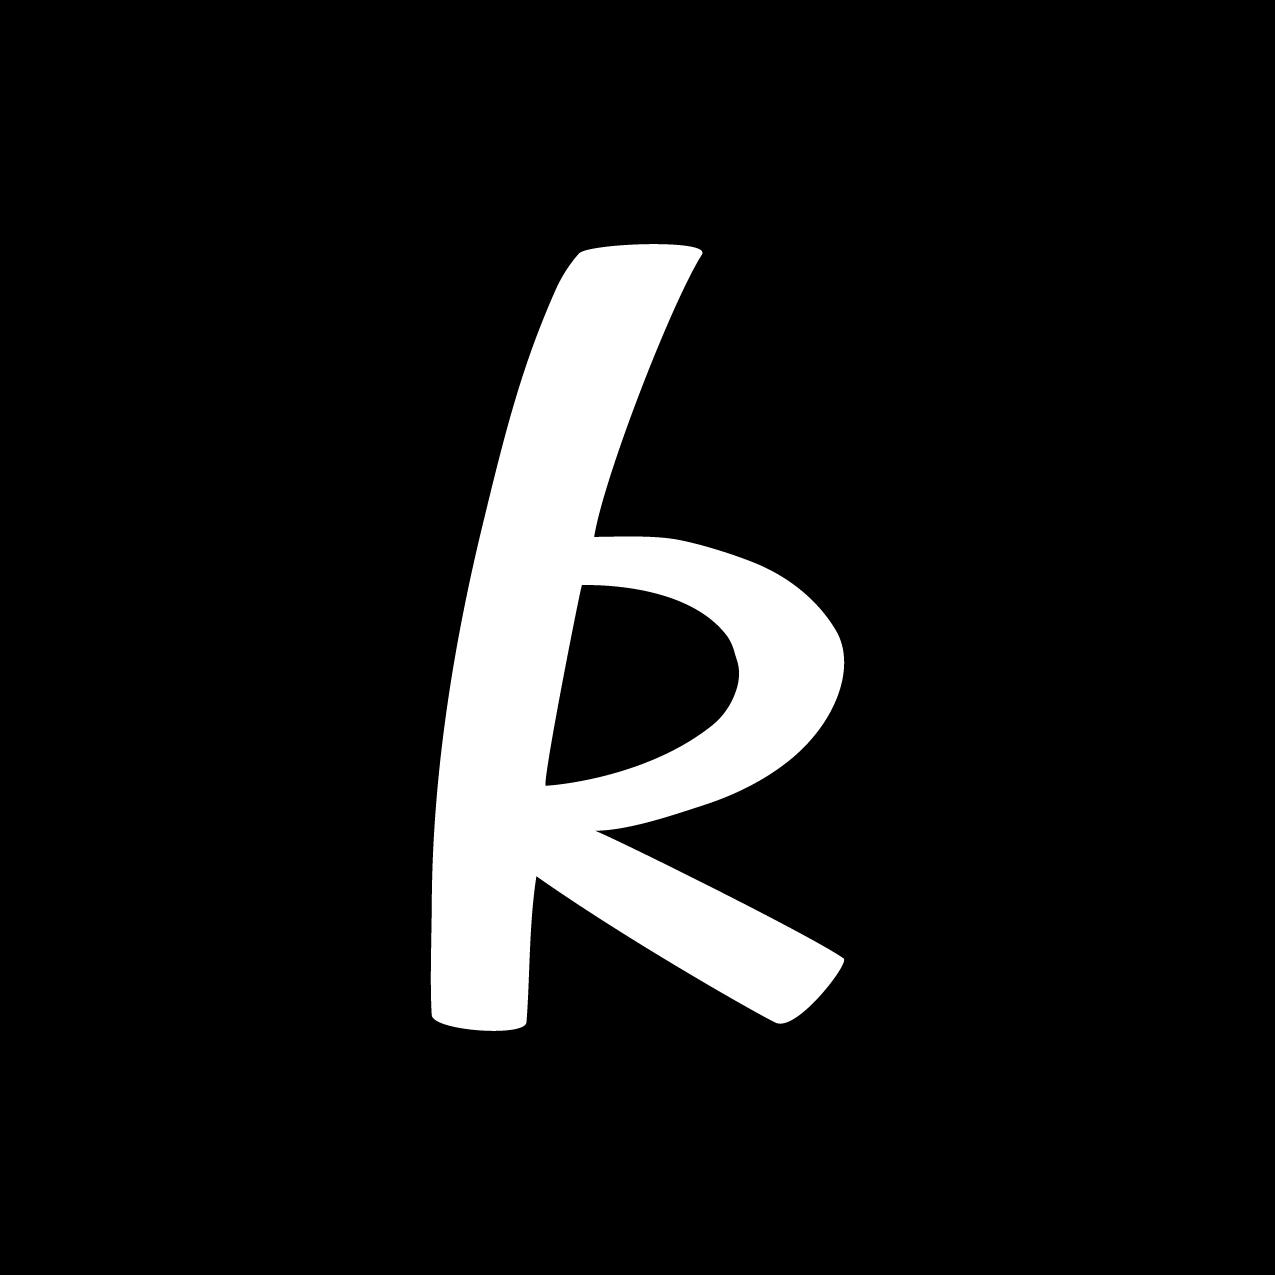 Letter K5 Design by Furia